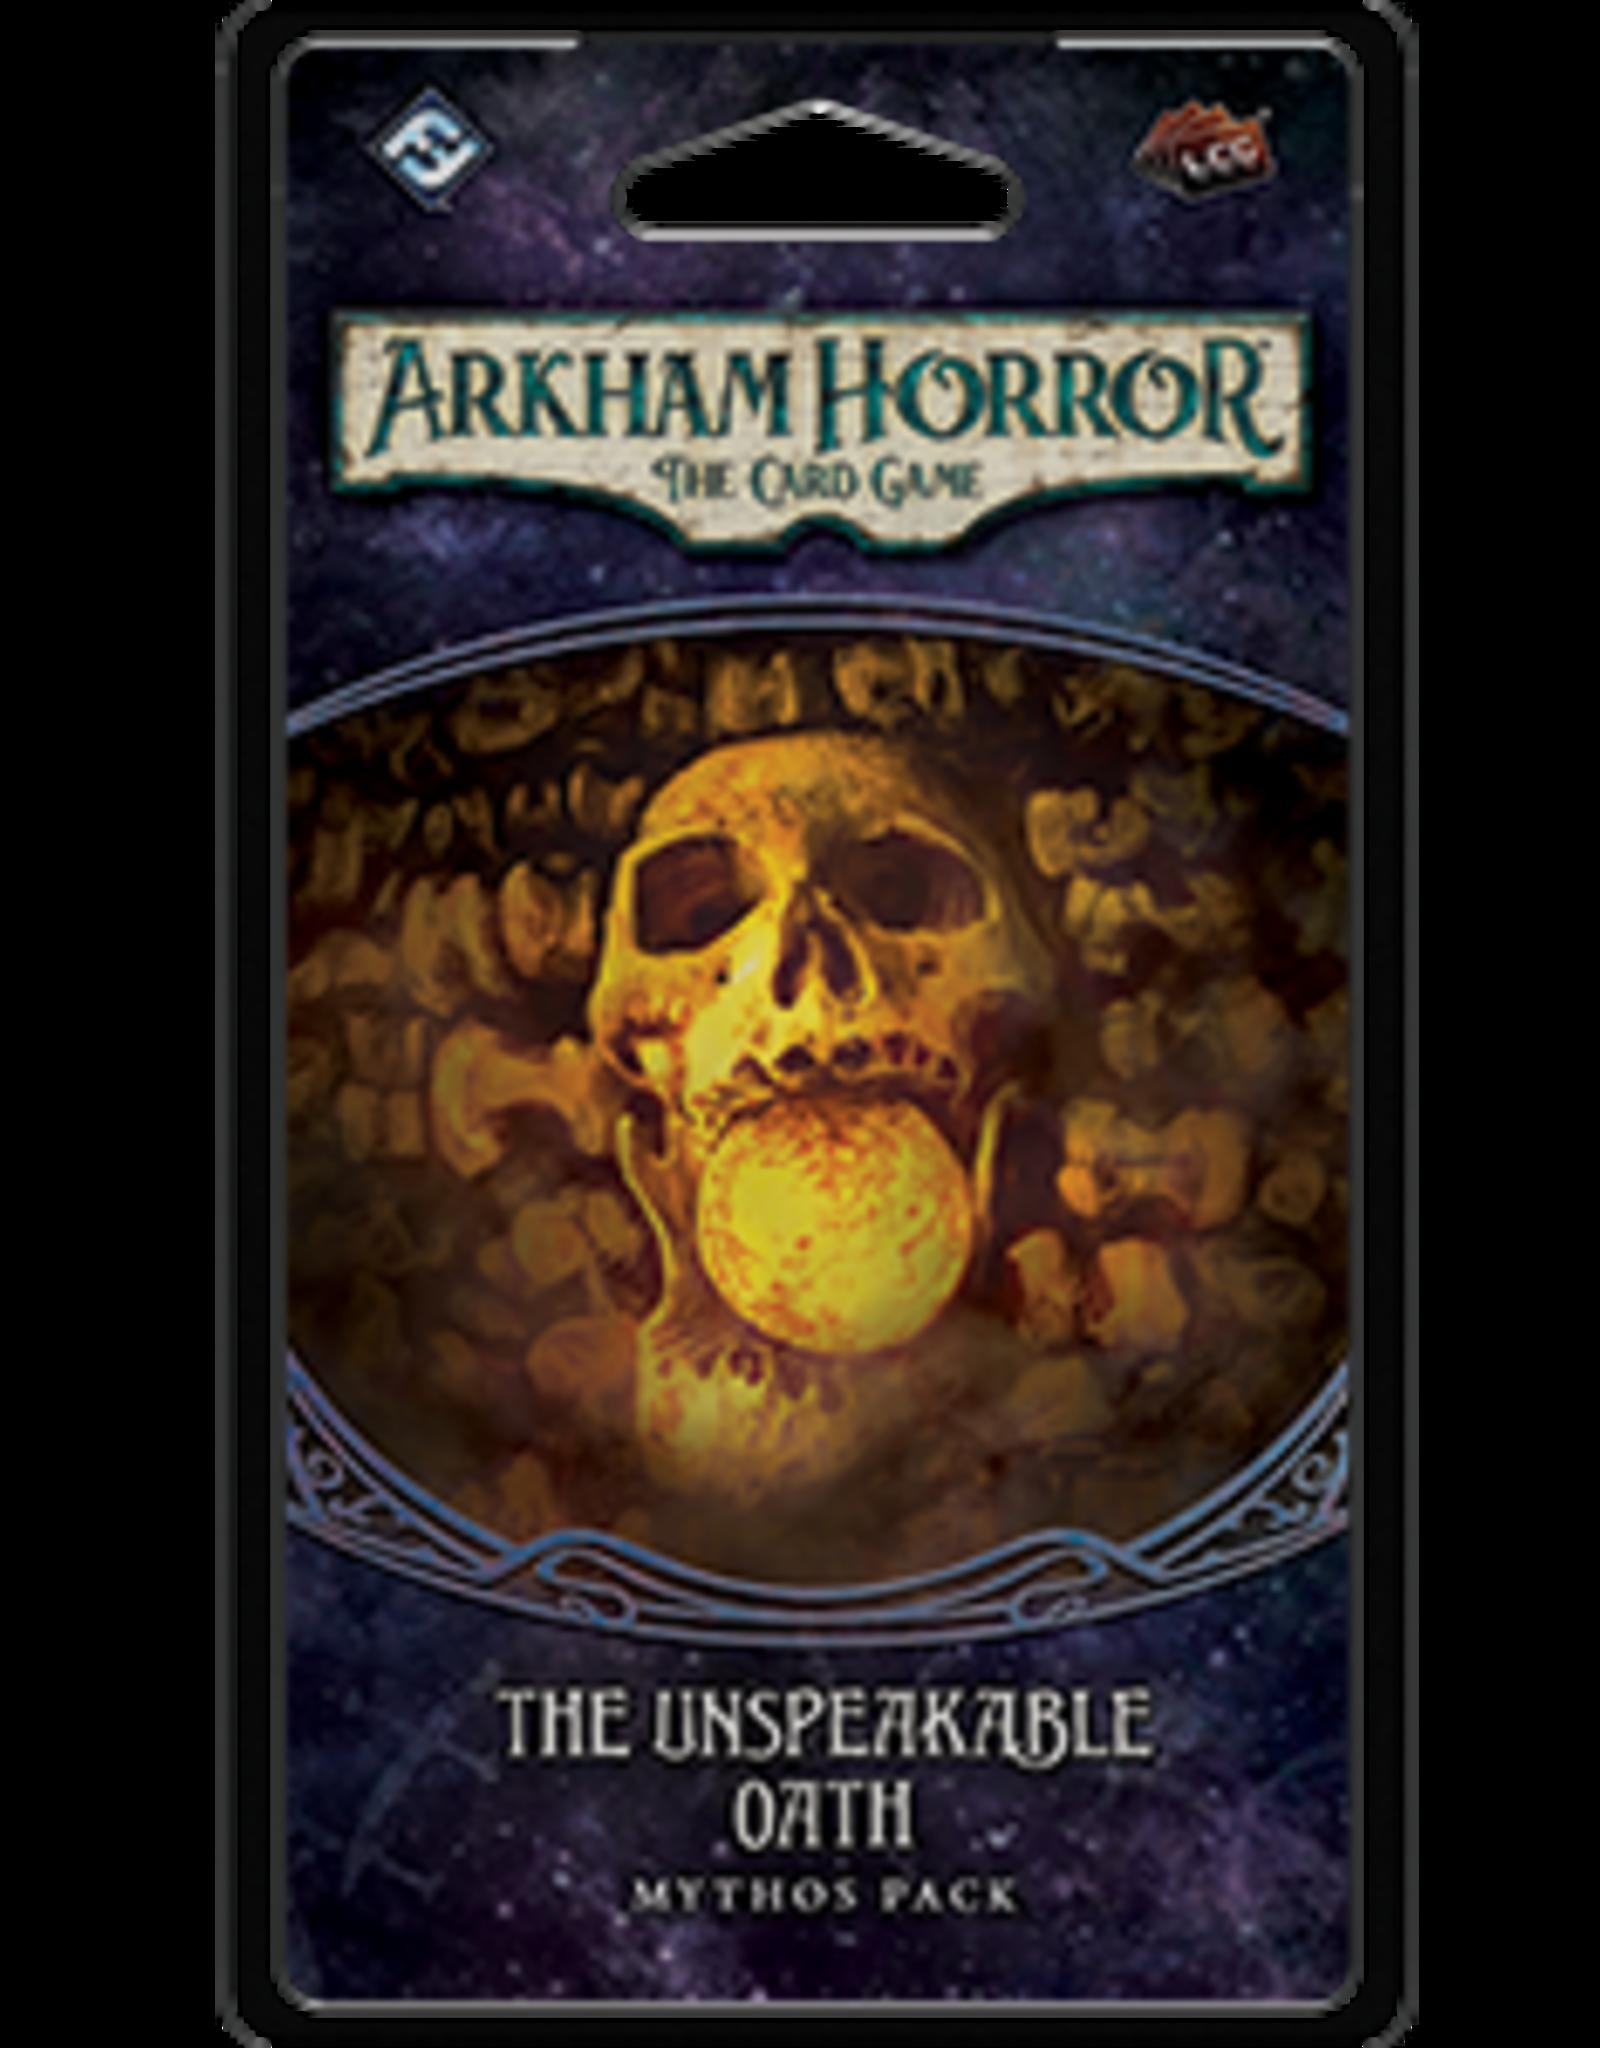 Fantasy Flight Arkham Horror LCG The Unspeakable Oath Mythos Pack